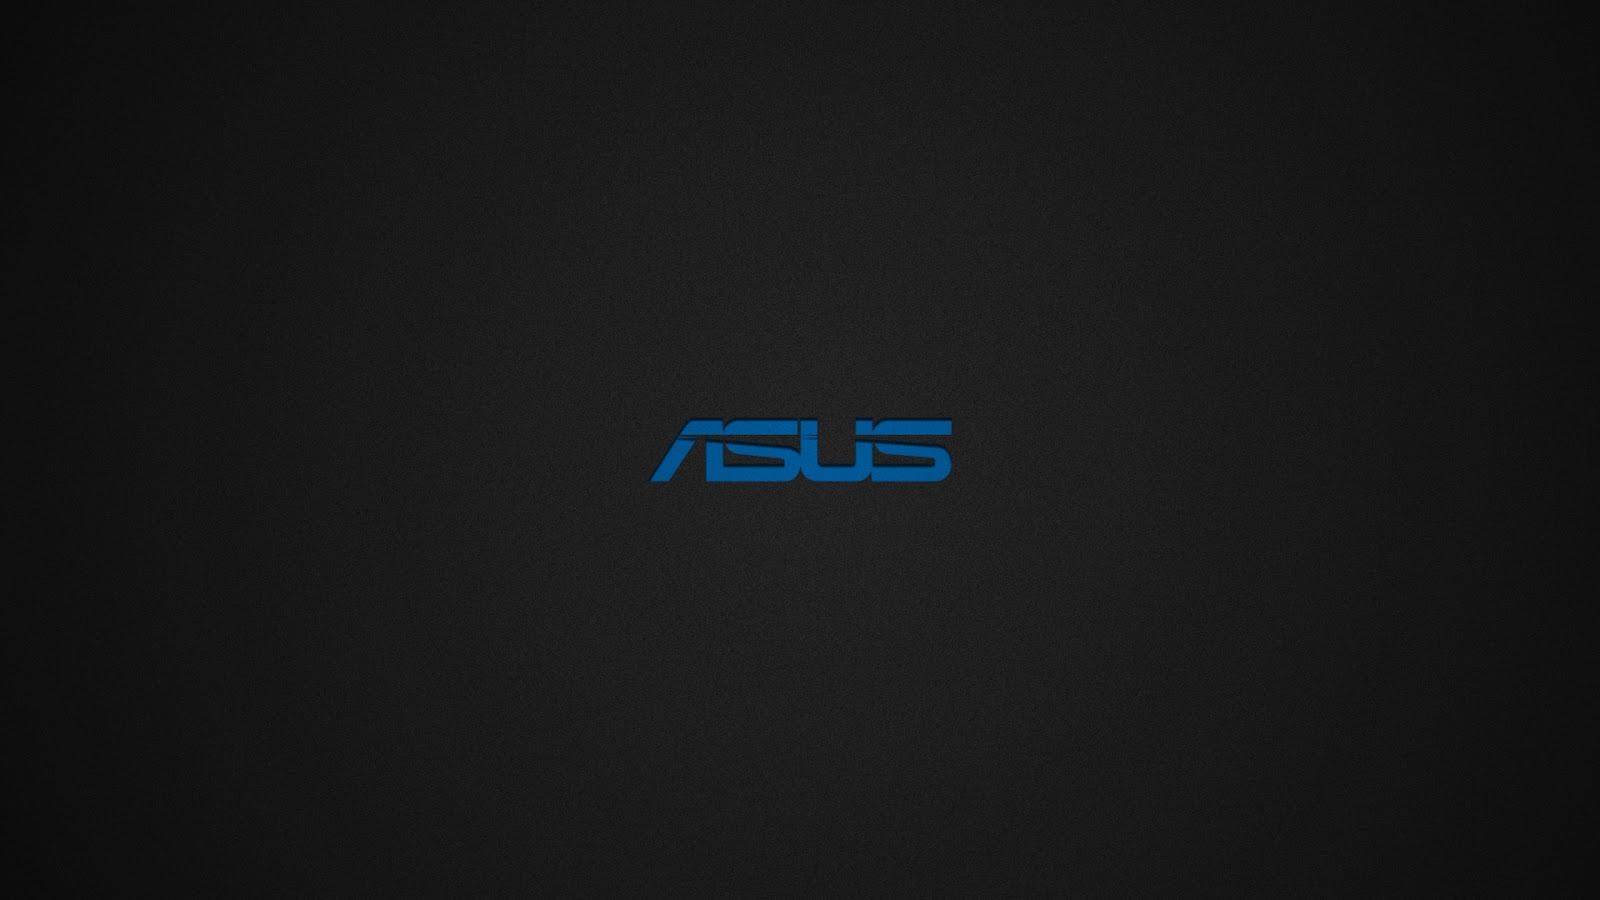 Asus Blue Wallpaper 1920 x 1080 ~ Serg - Digital Design Studio